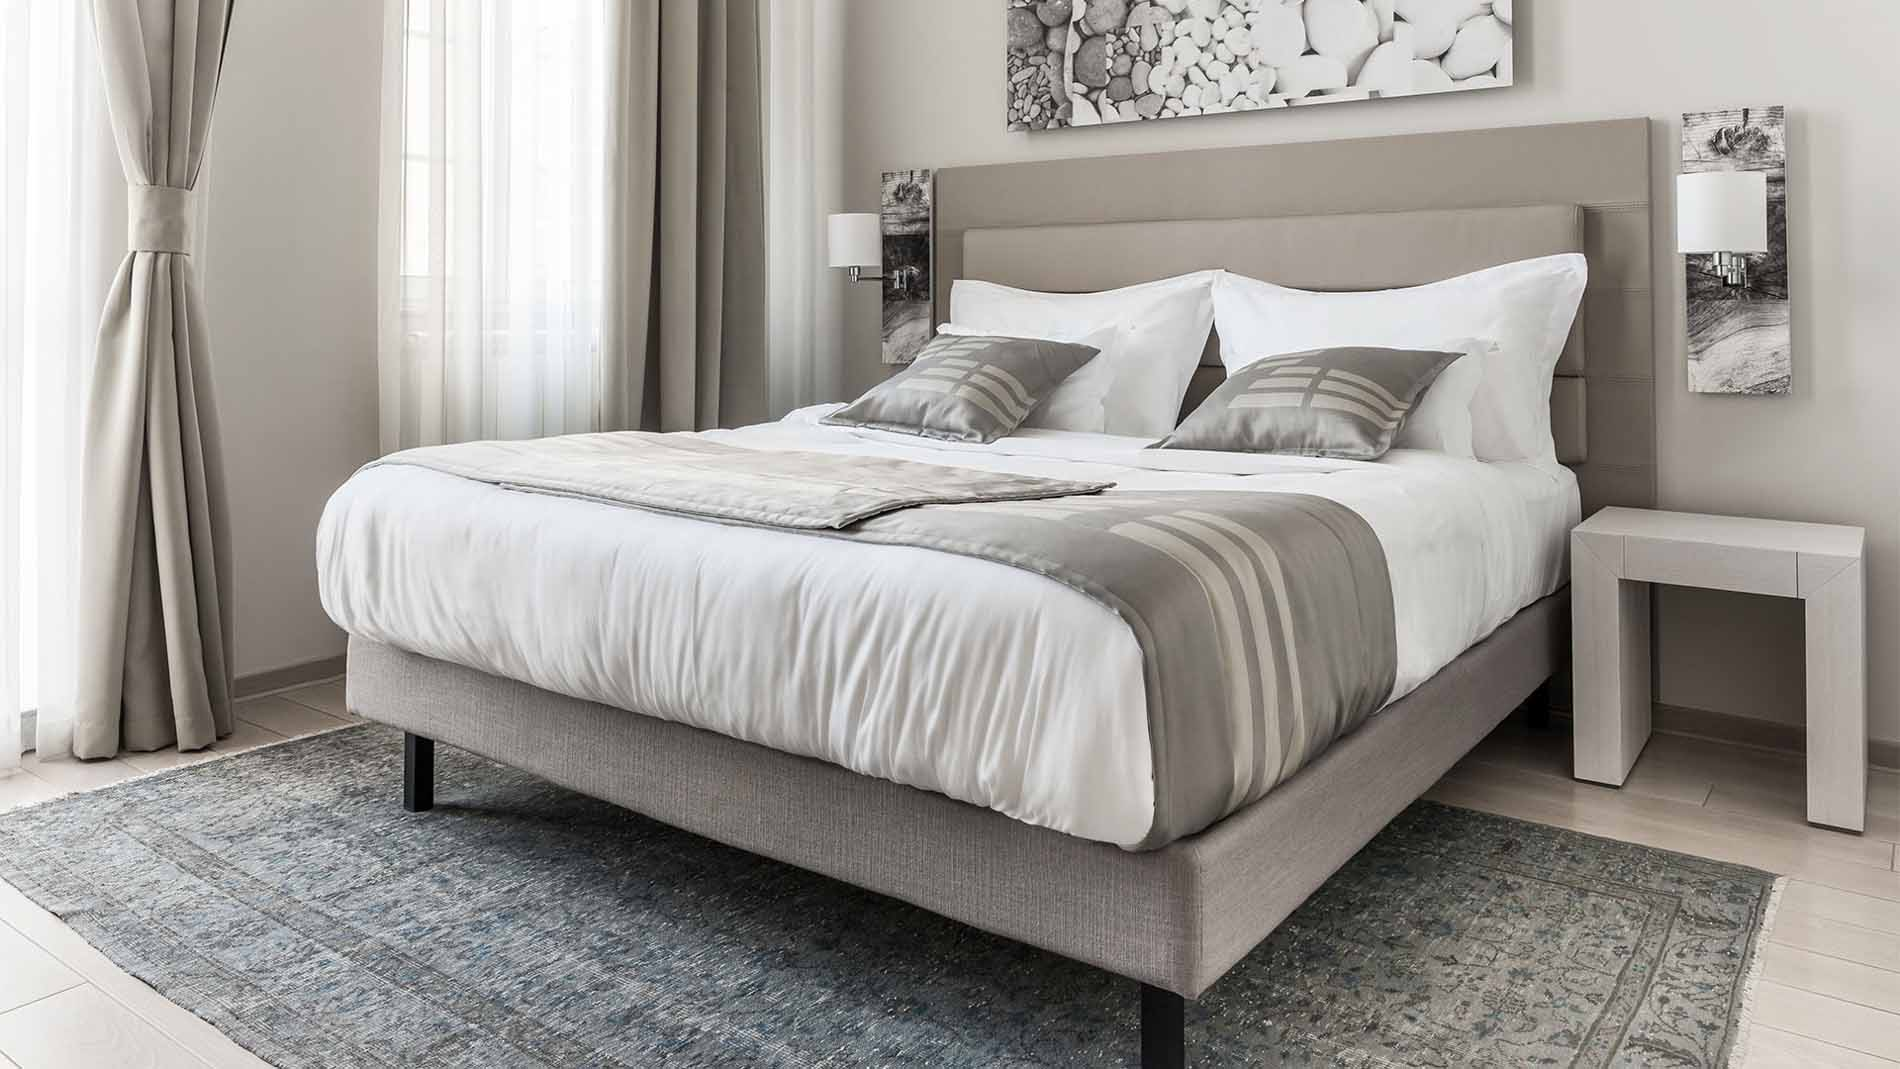 Biancheria da letto genova - Biancheria da letto ...